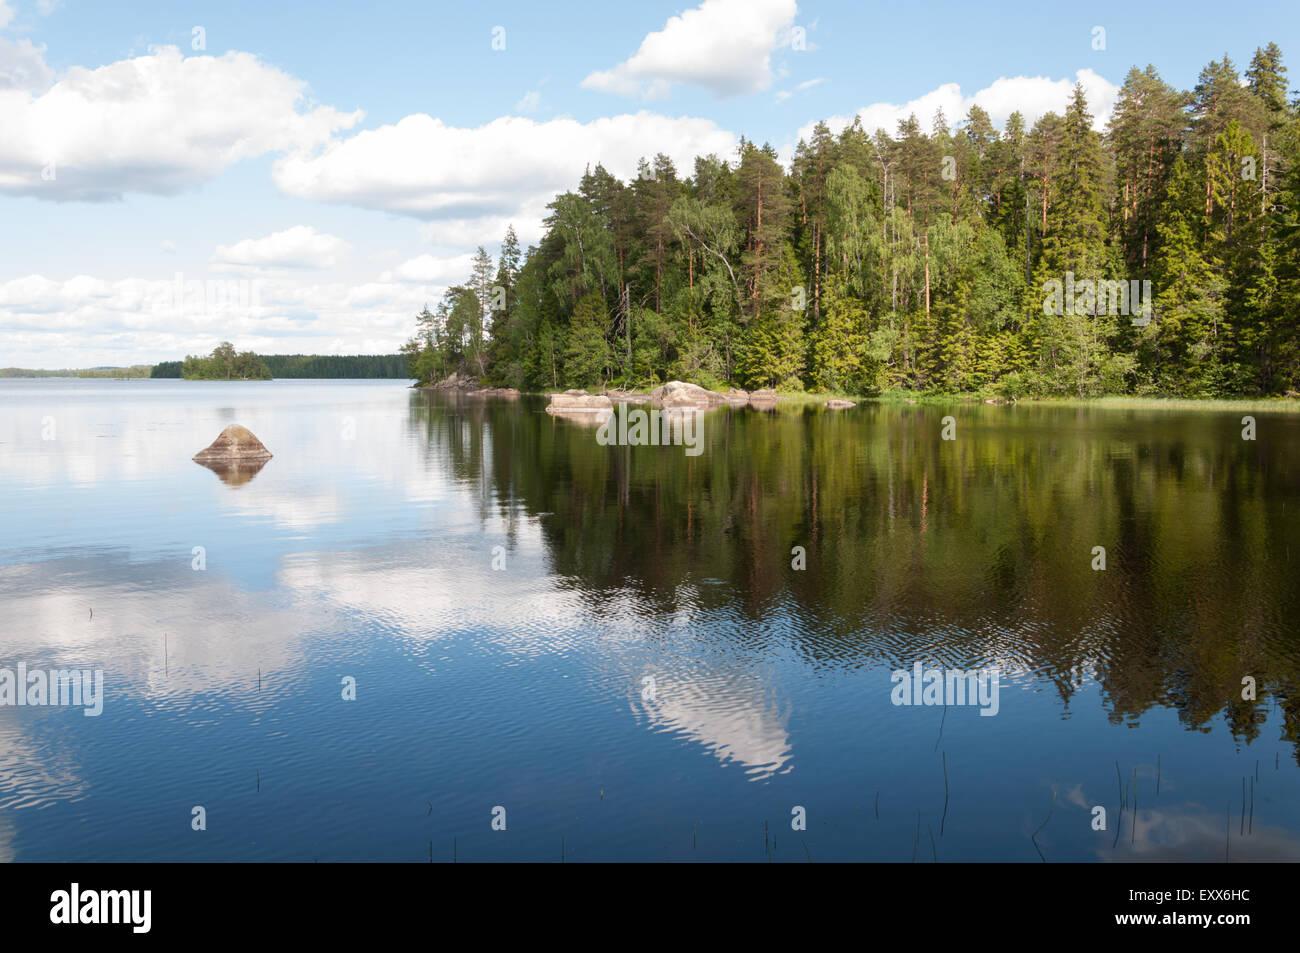 A summer view of Lake Liesjäri in Finland - Stock Image